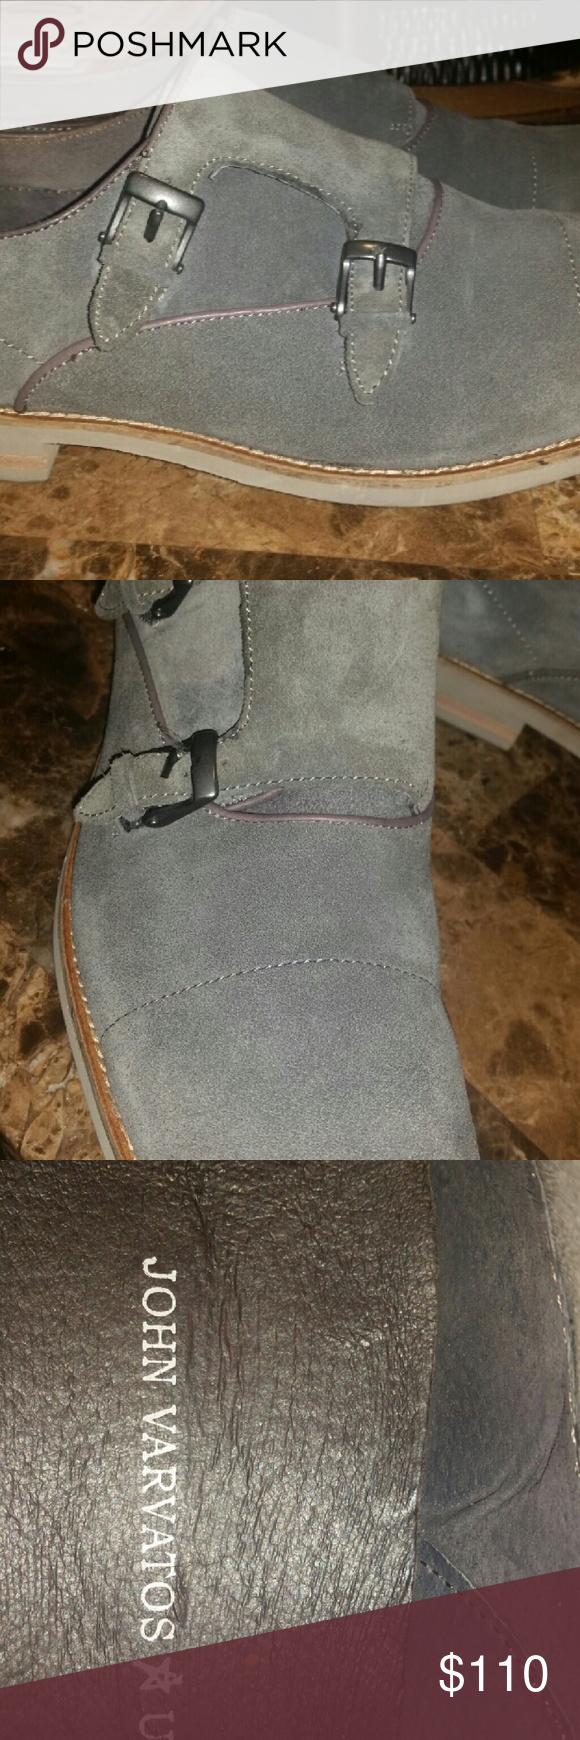 Shoes John varvatos double monk straps shoes john varvatos  Shoes